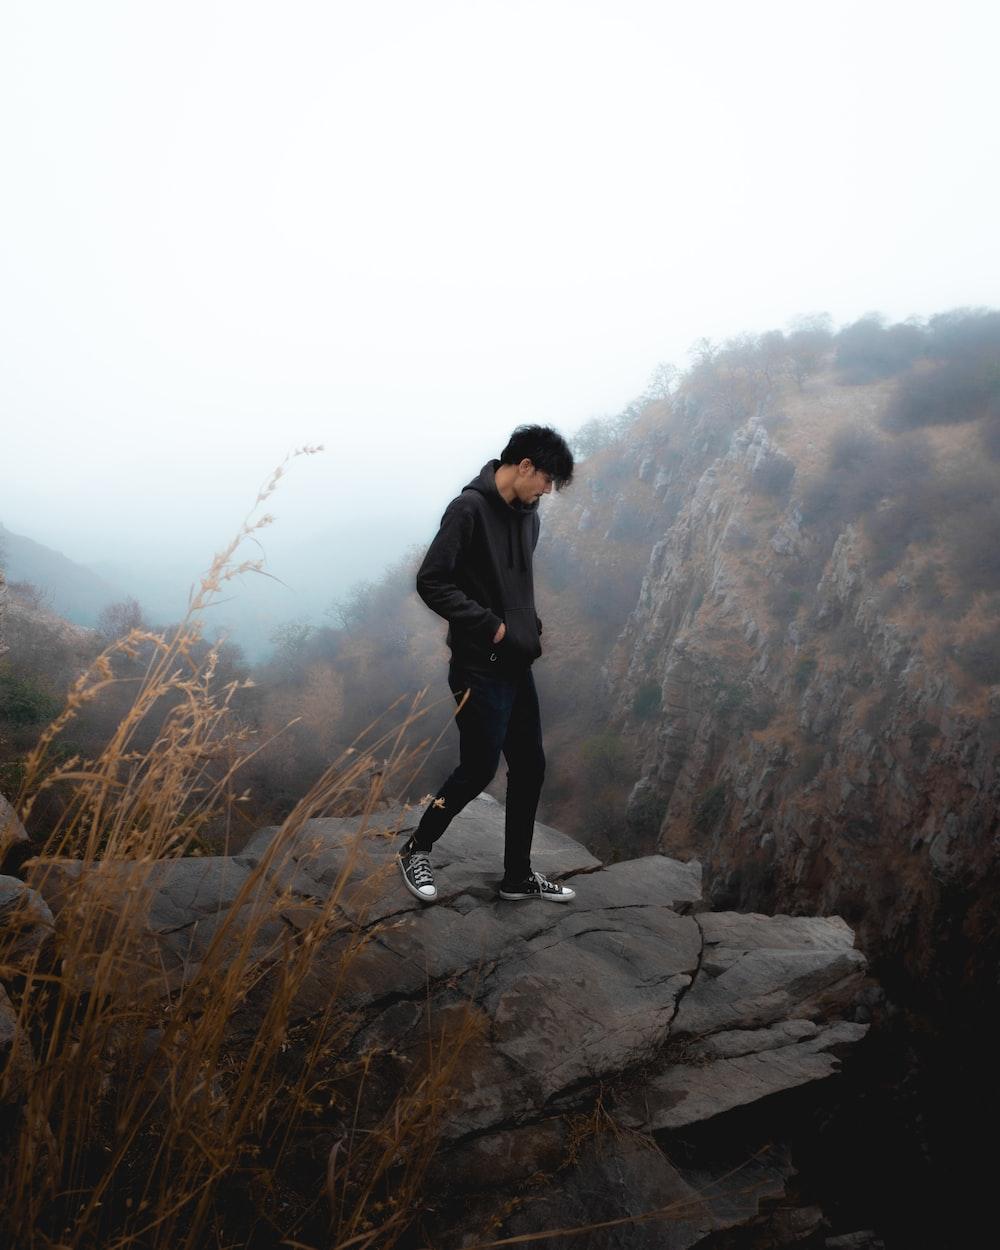 man in black jacket standing on rock during daytime